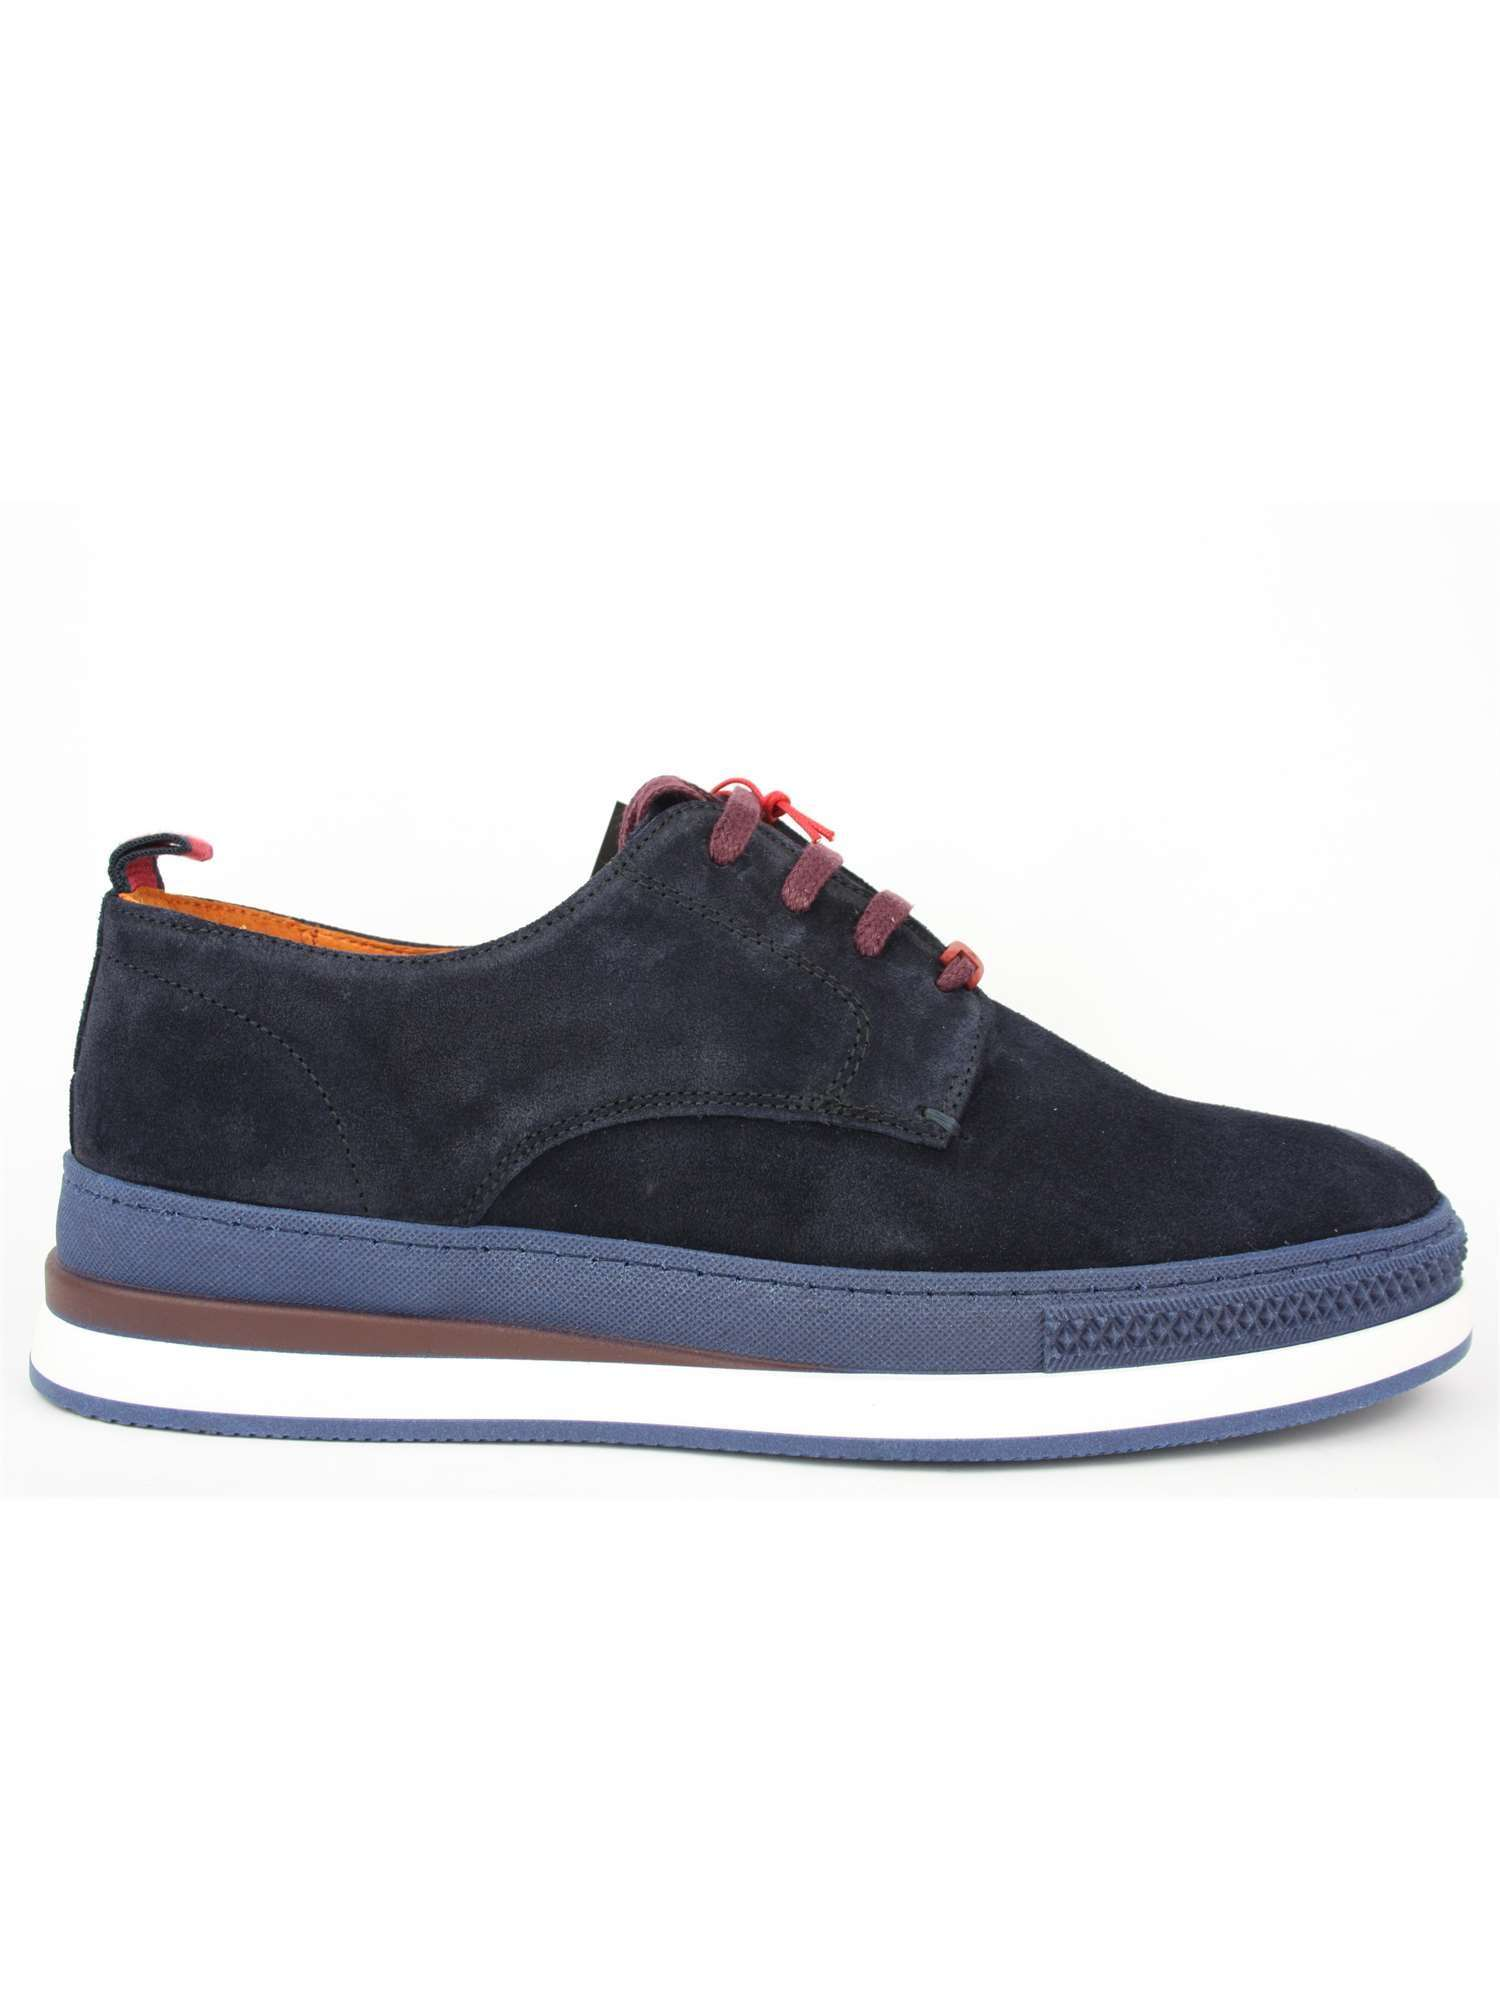 Ambitious Shoes 7977 Blu Scarpe Uomo 9d8f9535cd3